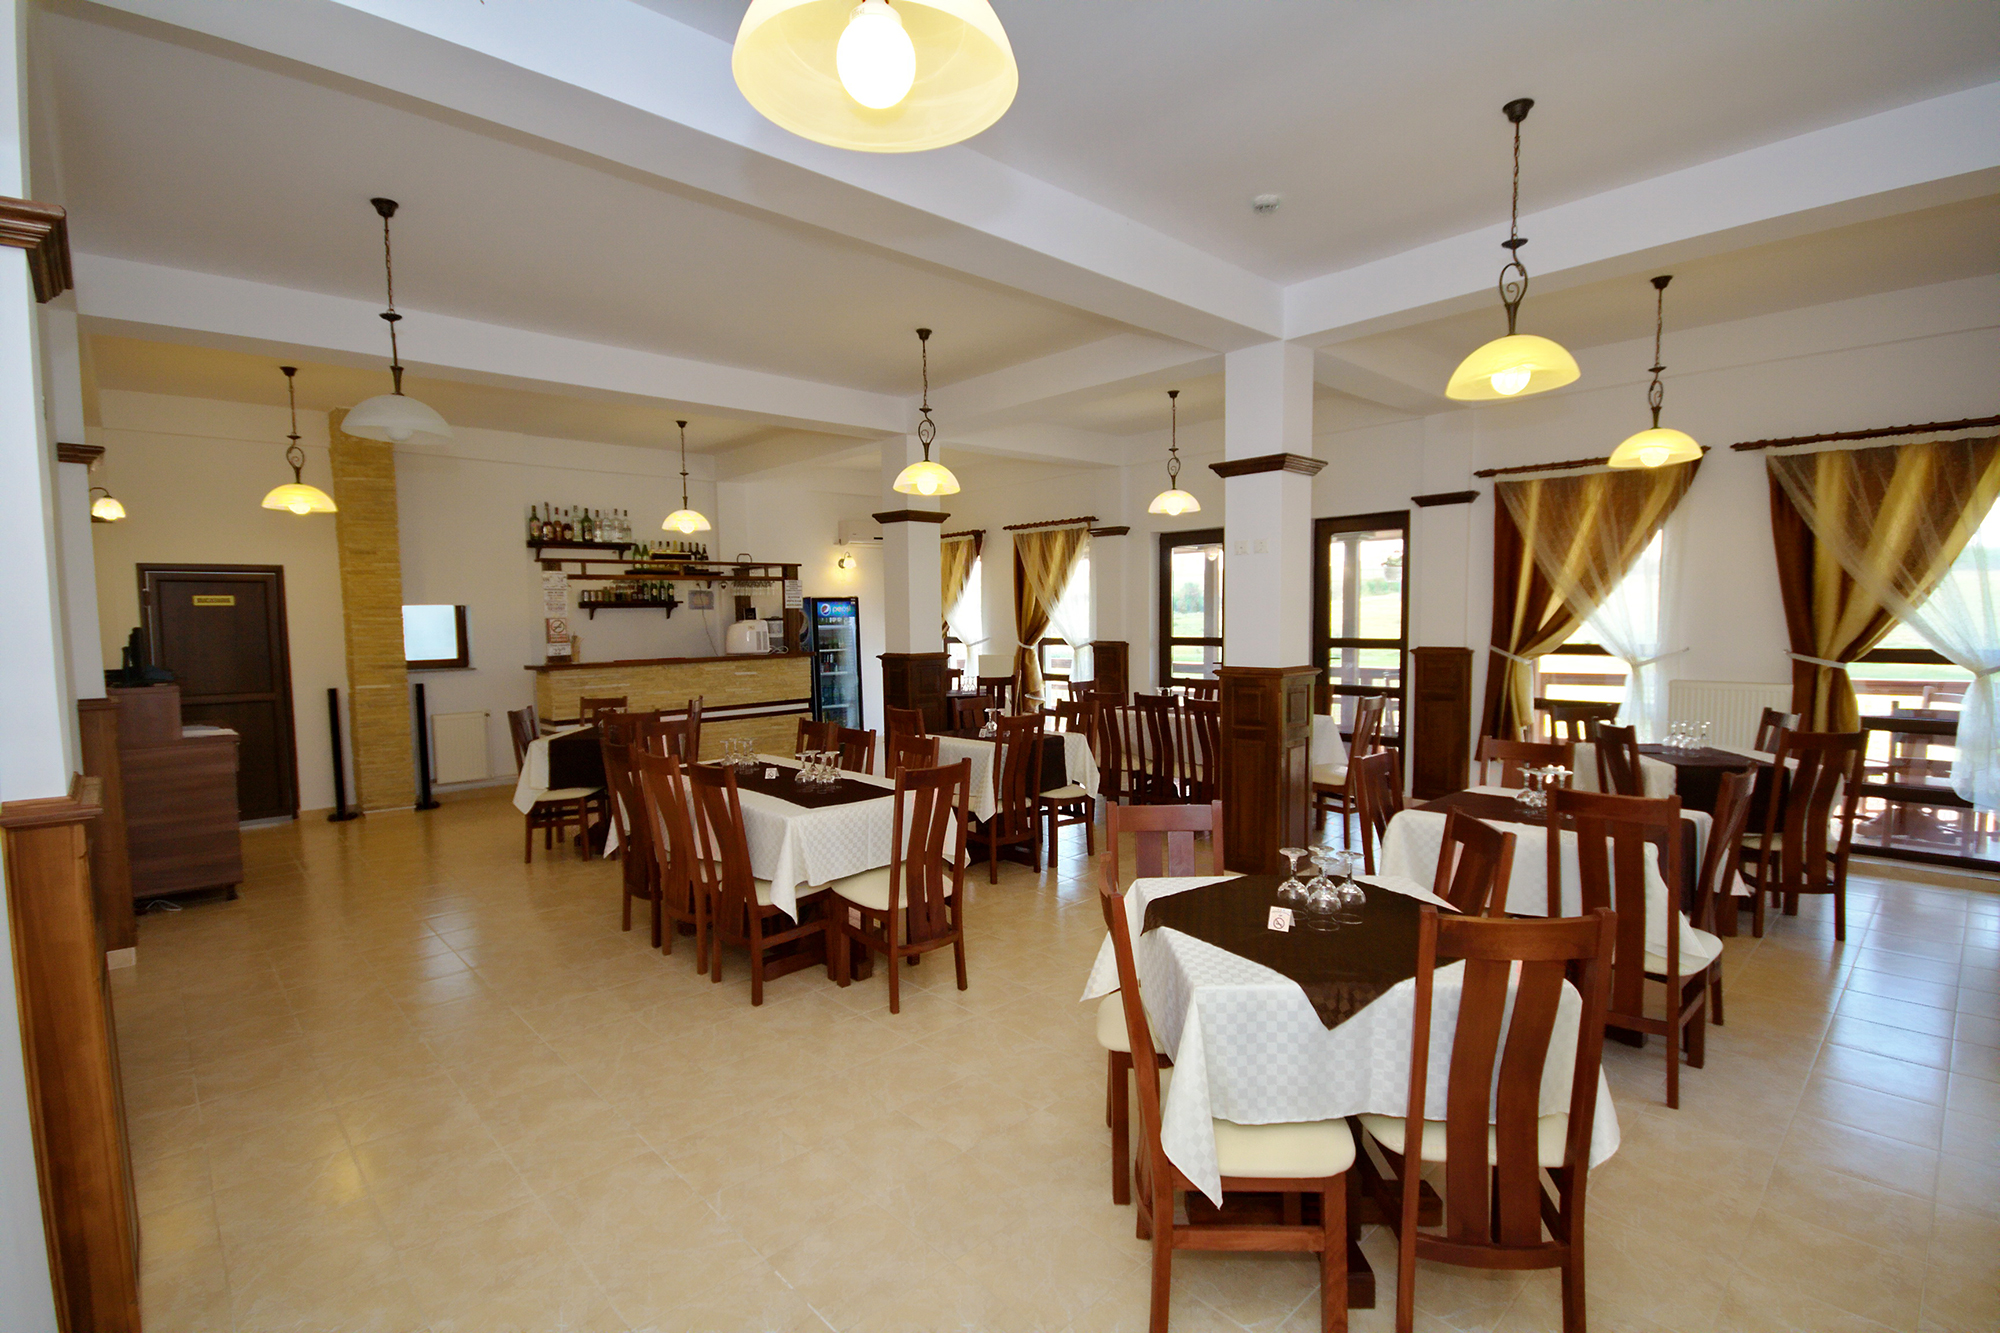 Restaurant - Pensiunea Lebada, Cazare in Delta Dunarii, Pensiune in Tulcea, Mineri (1)